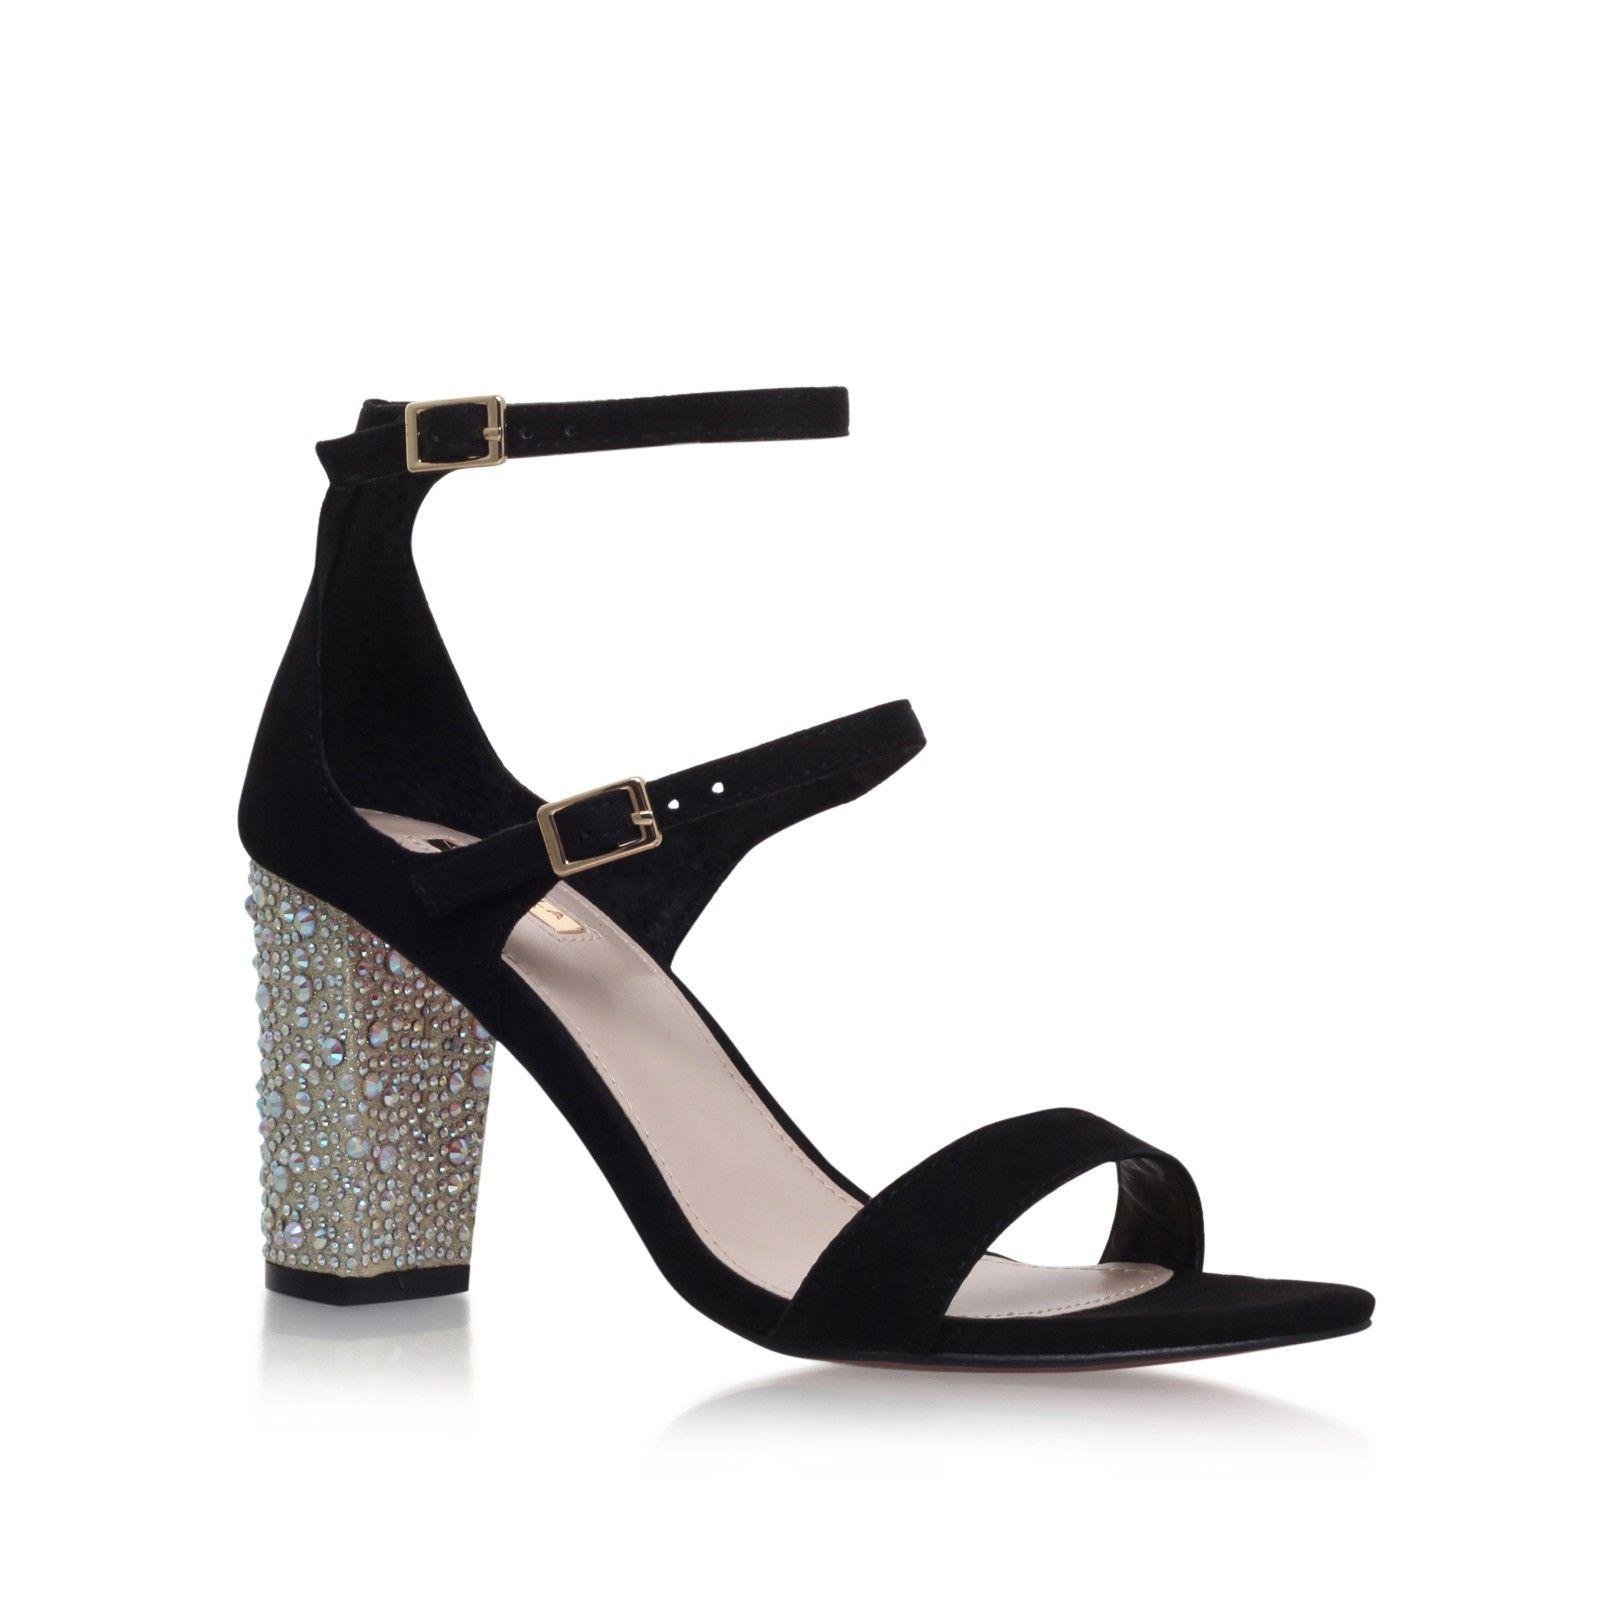 c330f9fbc46 geisha black mid heel sandals from Carvela Kurt Geiger